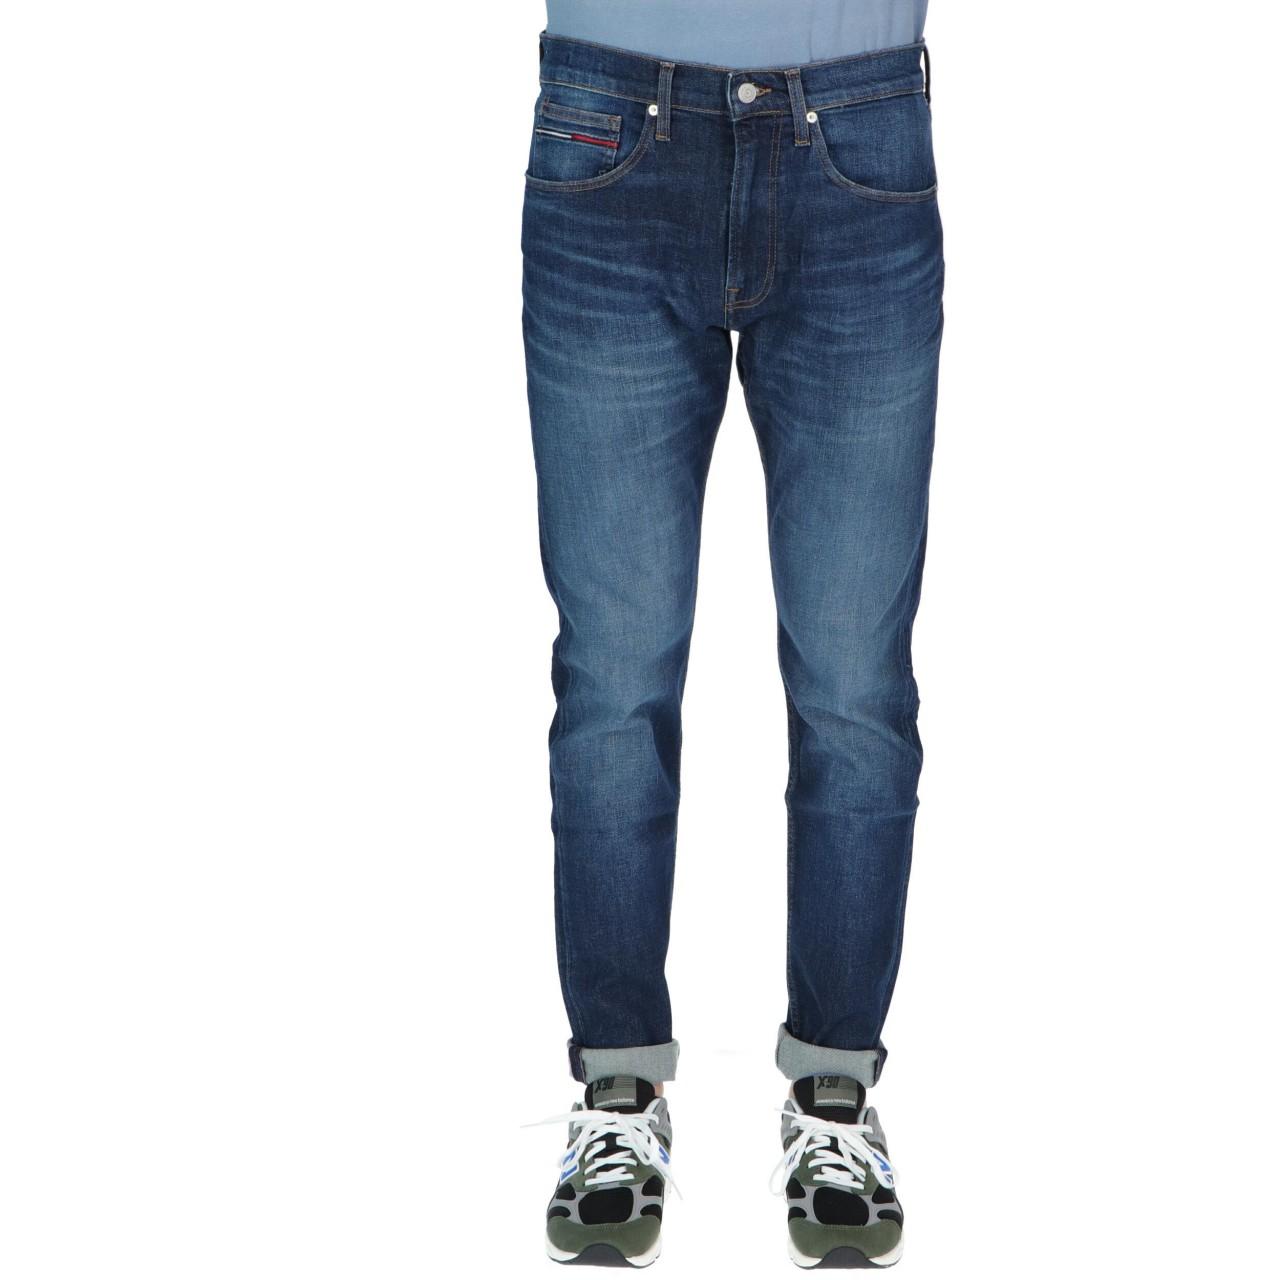 Tommy hilfiger Jeans Tommy Jeans Uomo Taperad Tj 1988 06420M